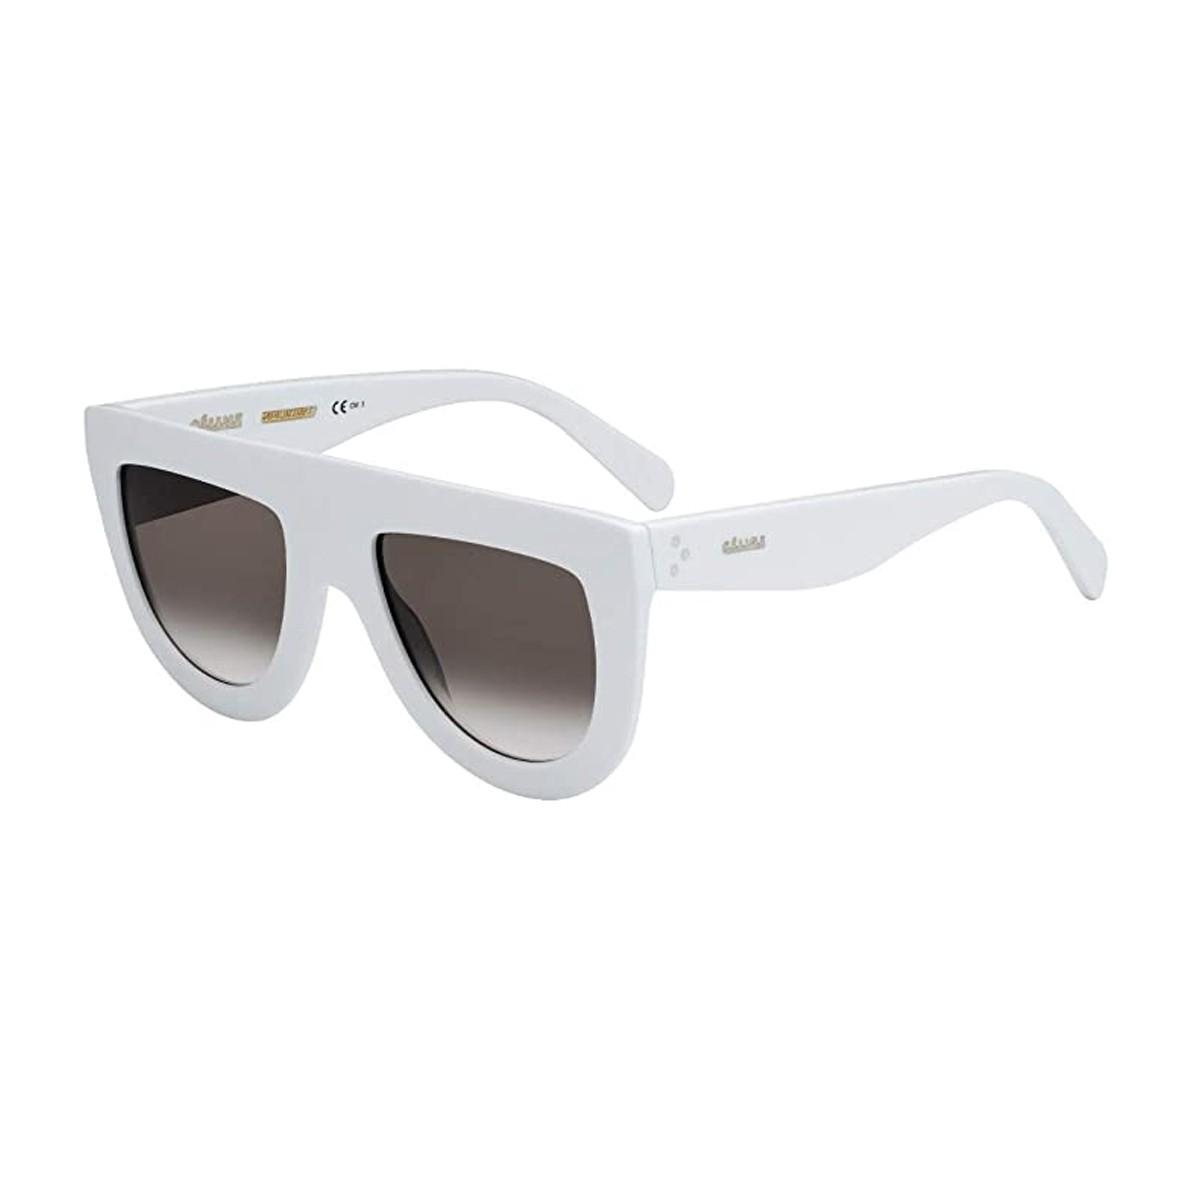 Celine CL 41398/s   Women's sunglasses